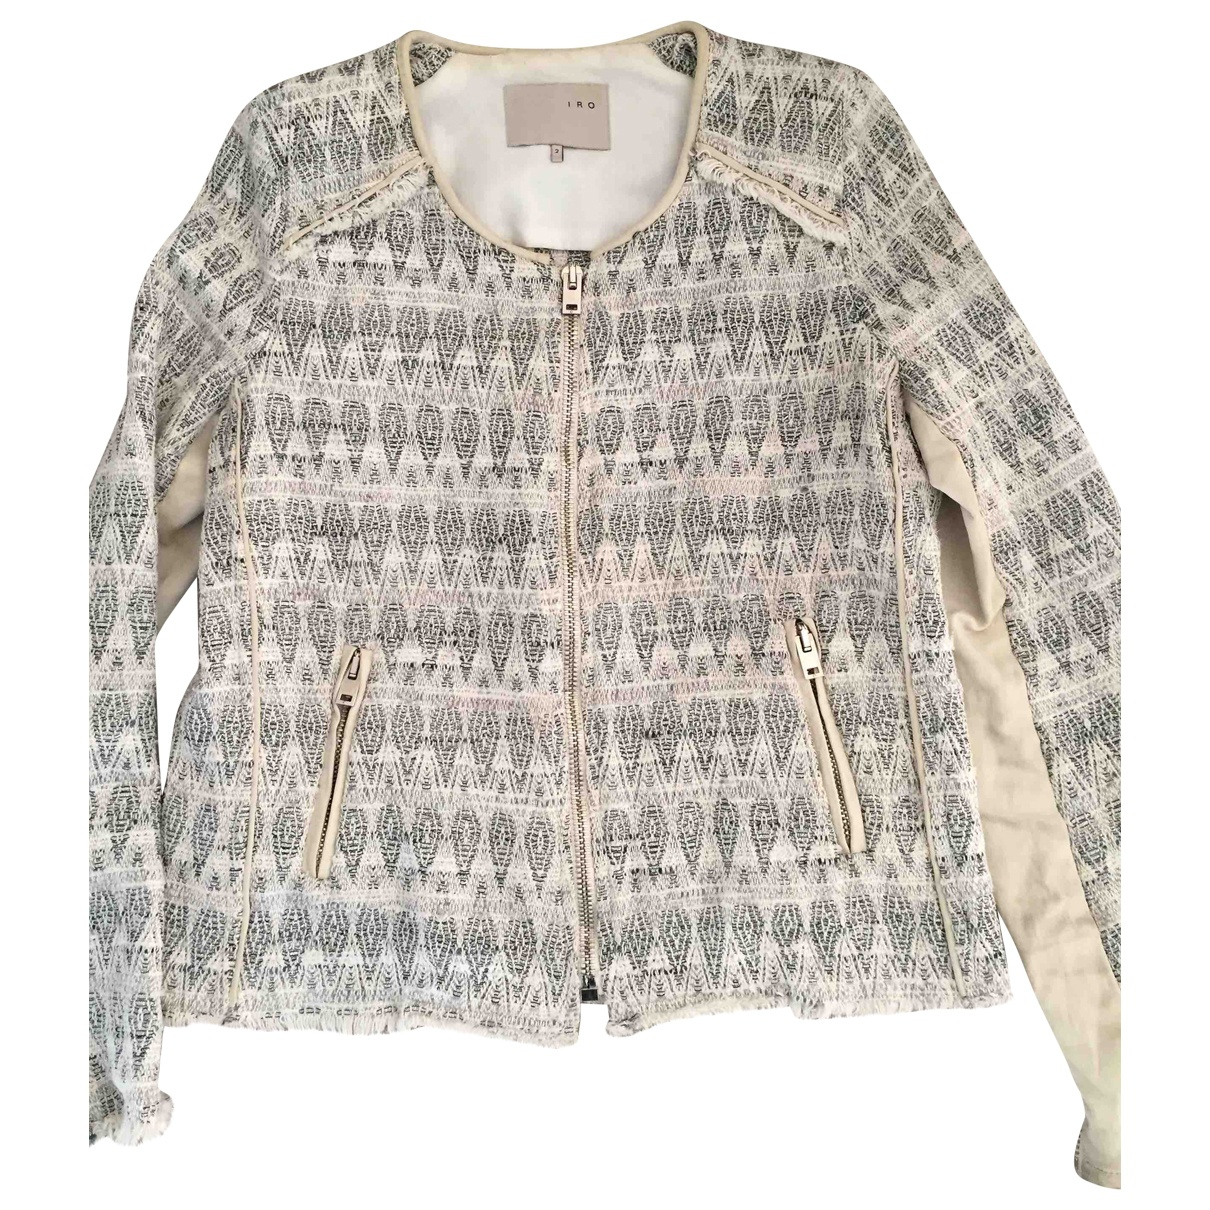 Iro \N Multicolour Cotton jacket for Women 2 0-5